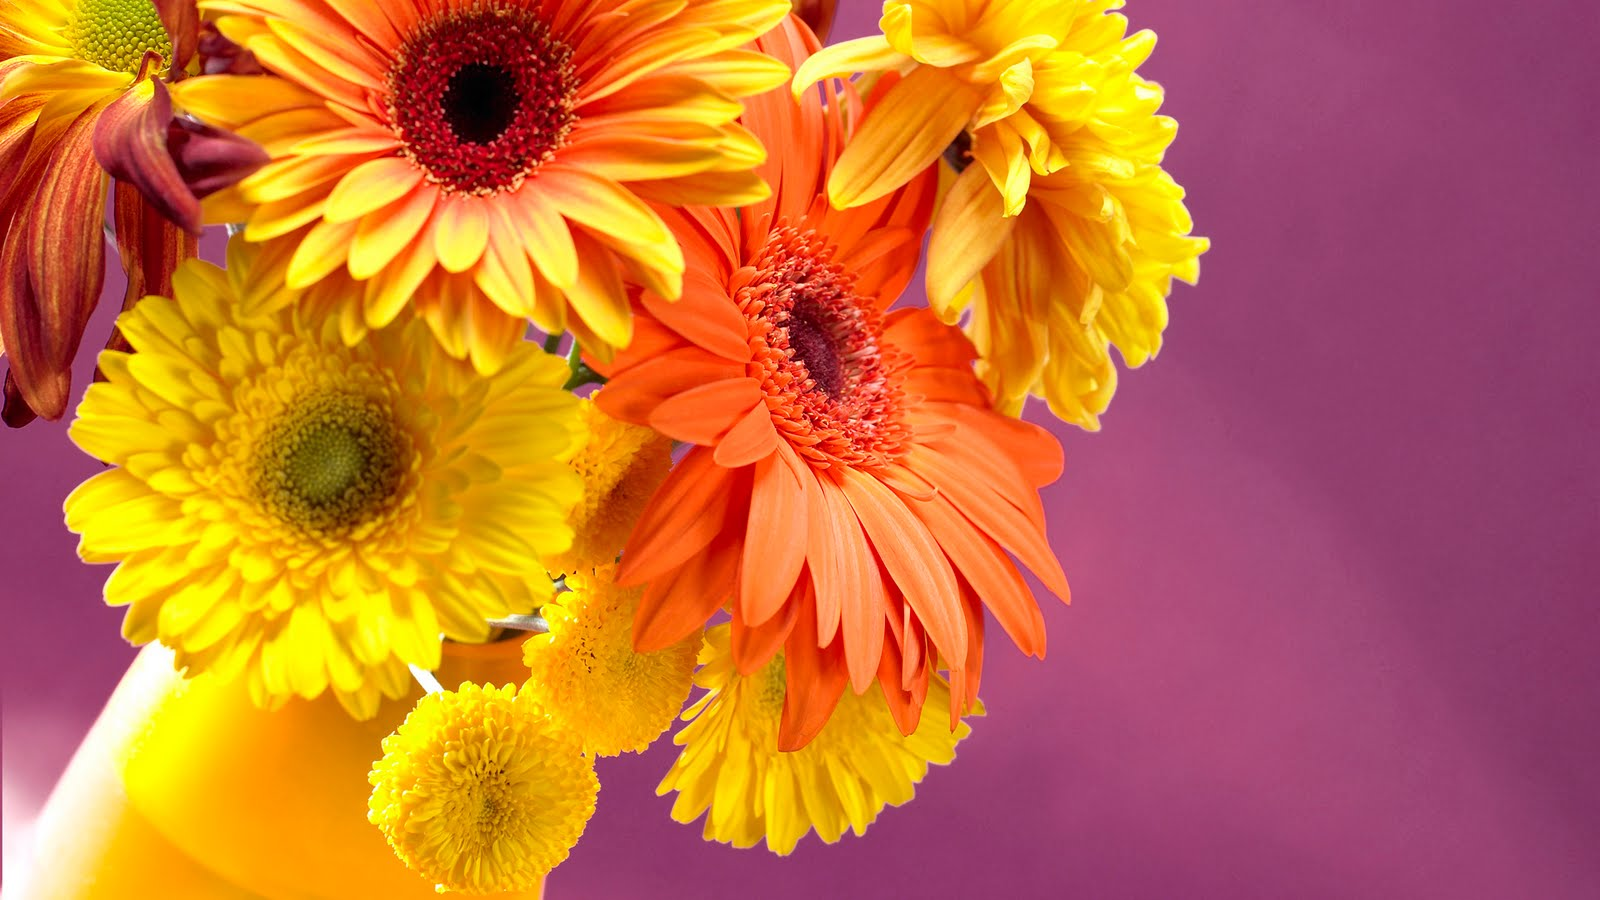 Jaspreet Rekhi 40 Colorful Flowers Wallpapers Full HD 1080prar 1600x900